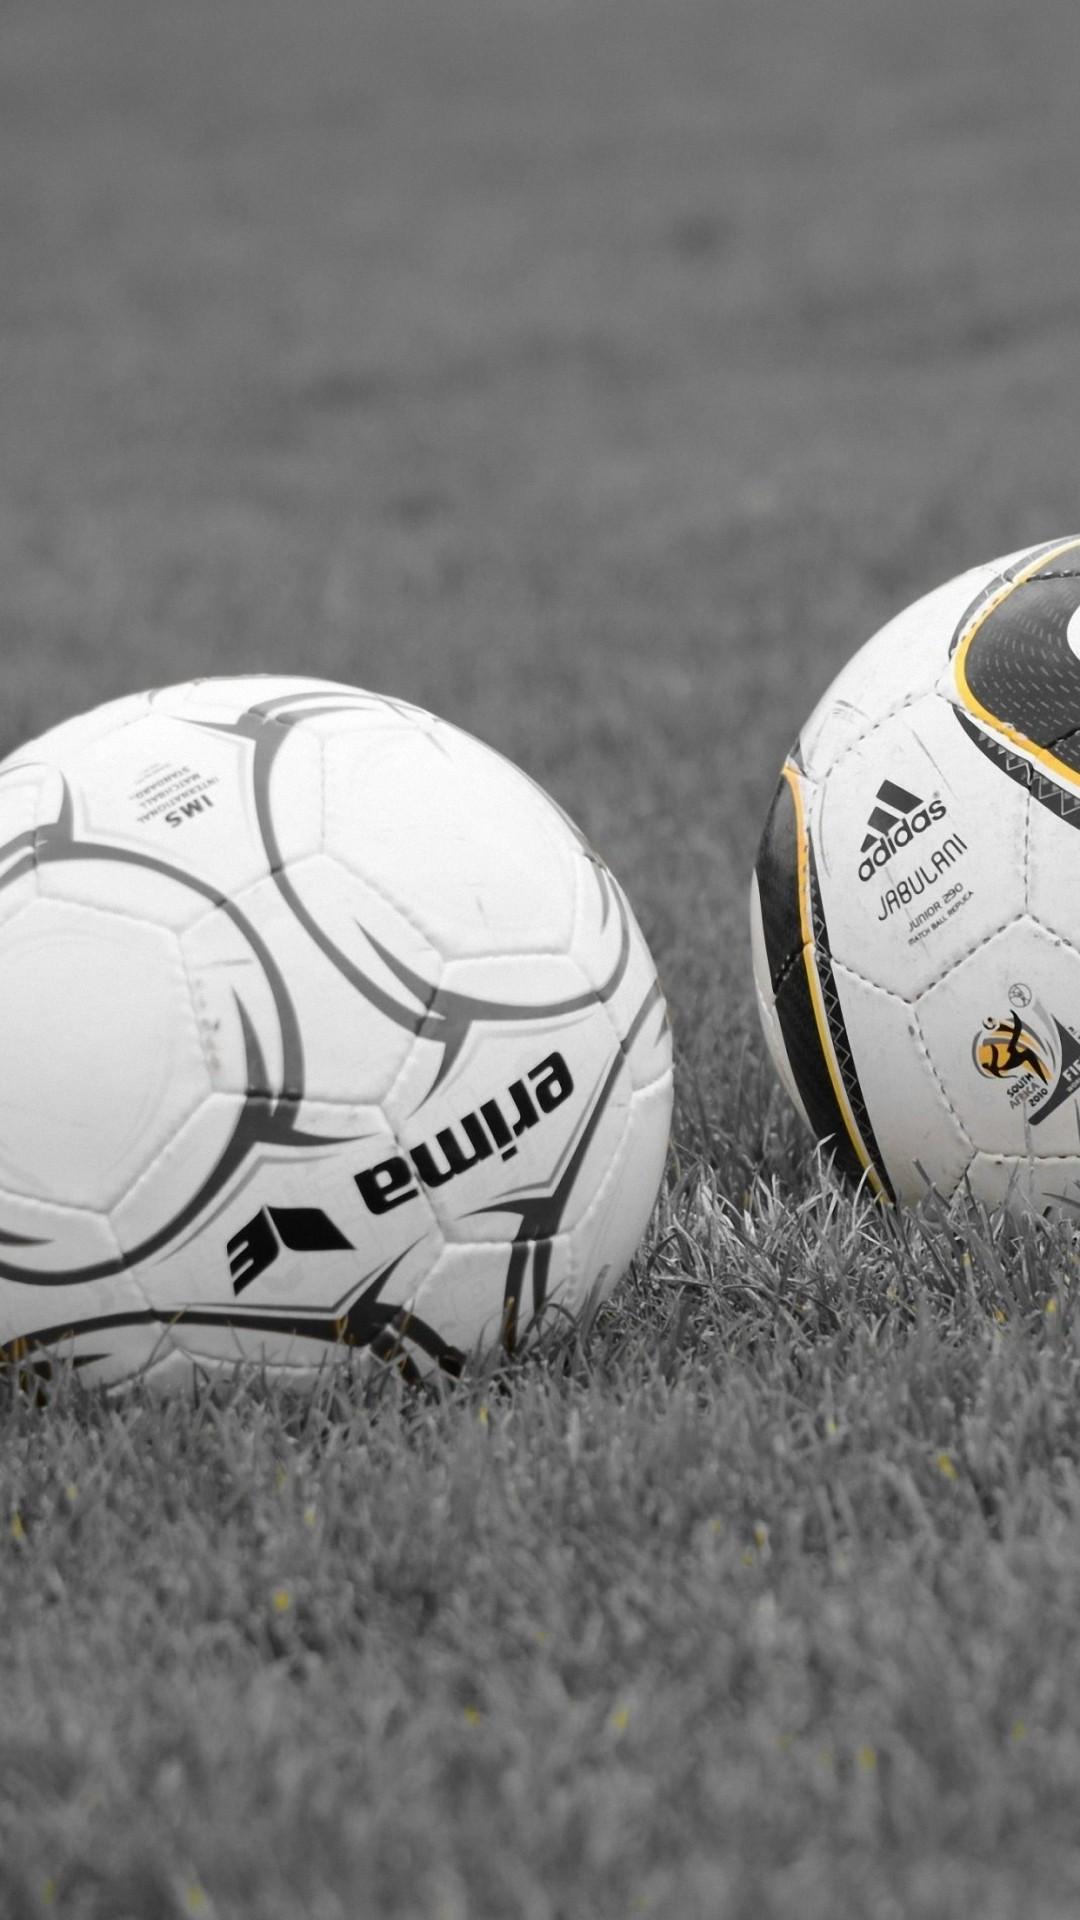 Cool Soccer iPhone wallpaper